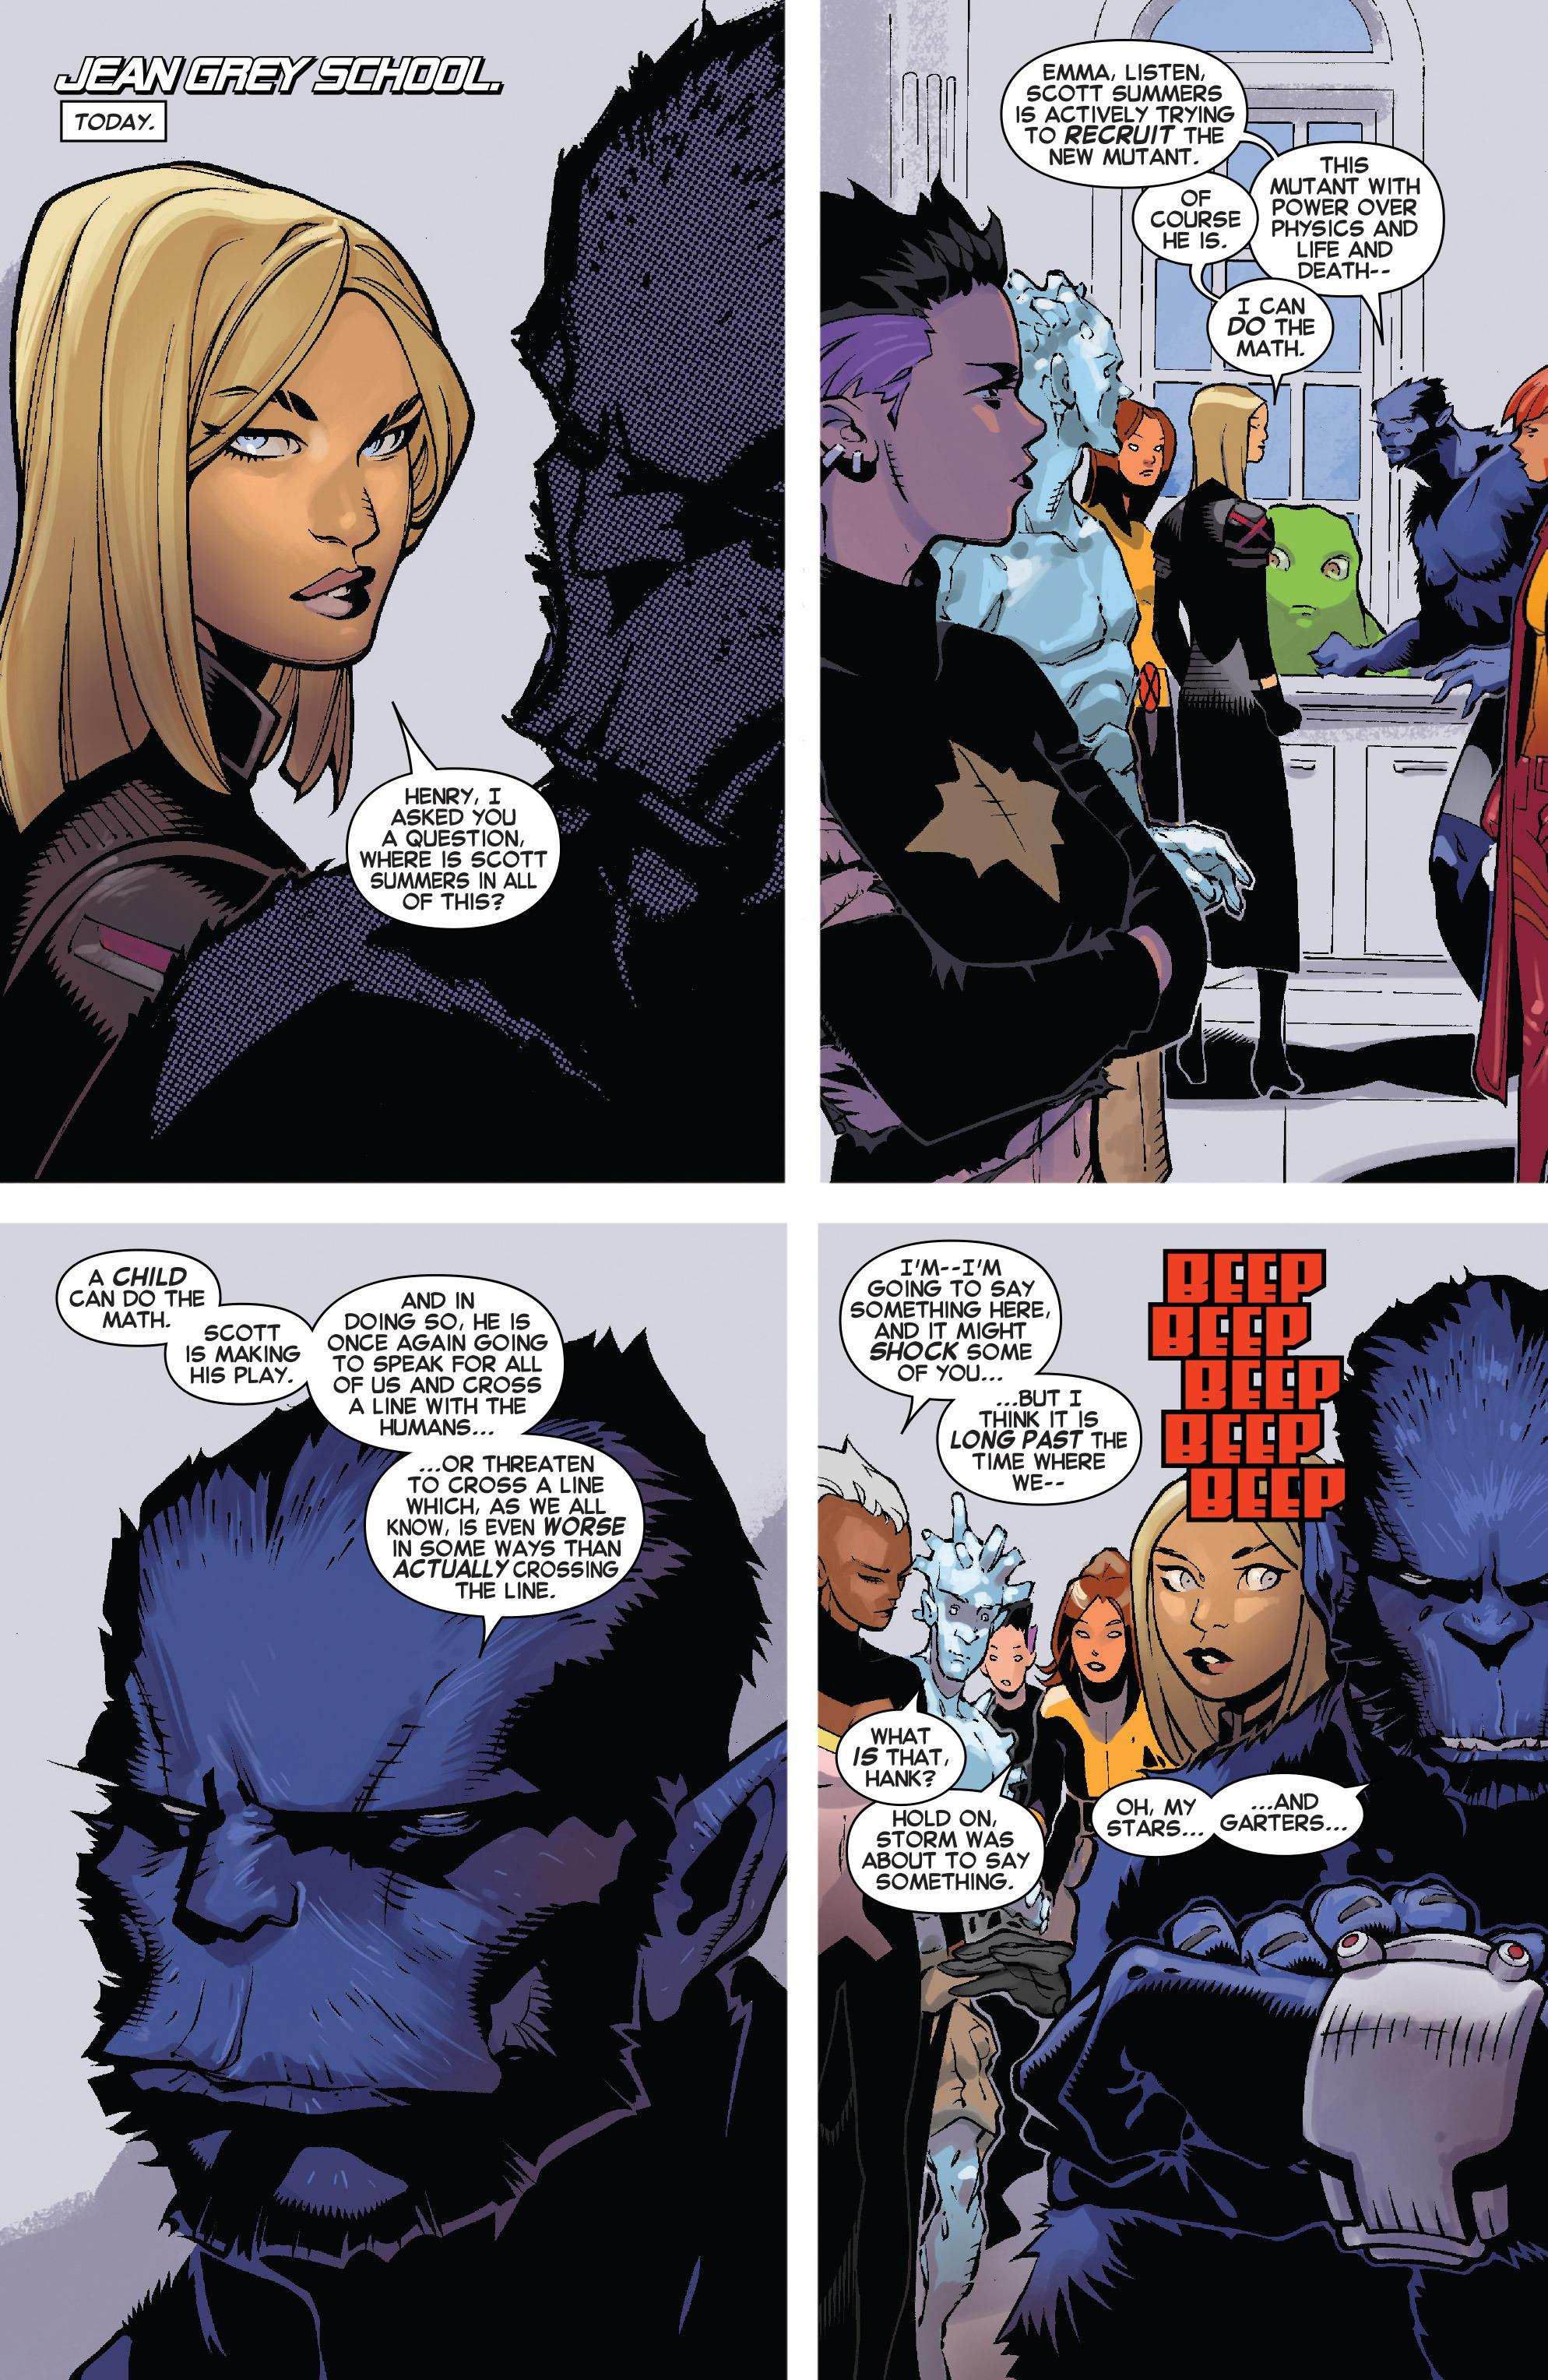 Read online Uncanny X-Men (2013) comic -  Issue # _TPB 5 - The Omega Mutant - 81